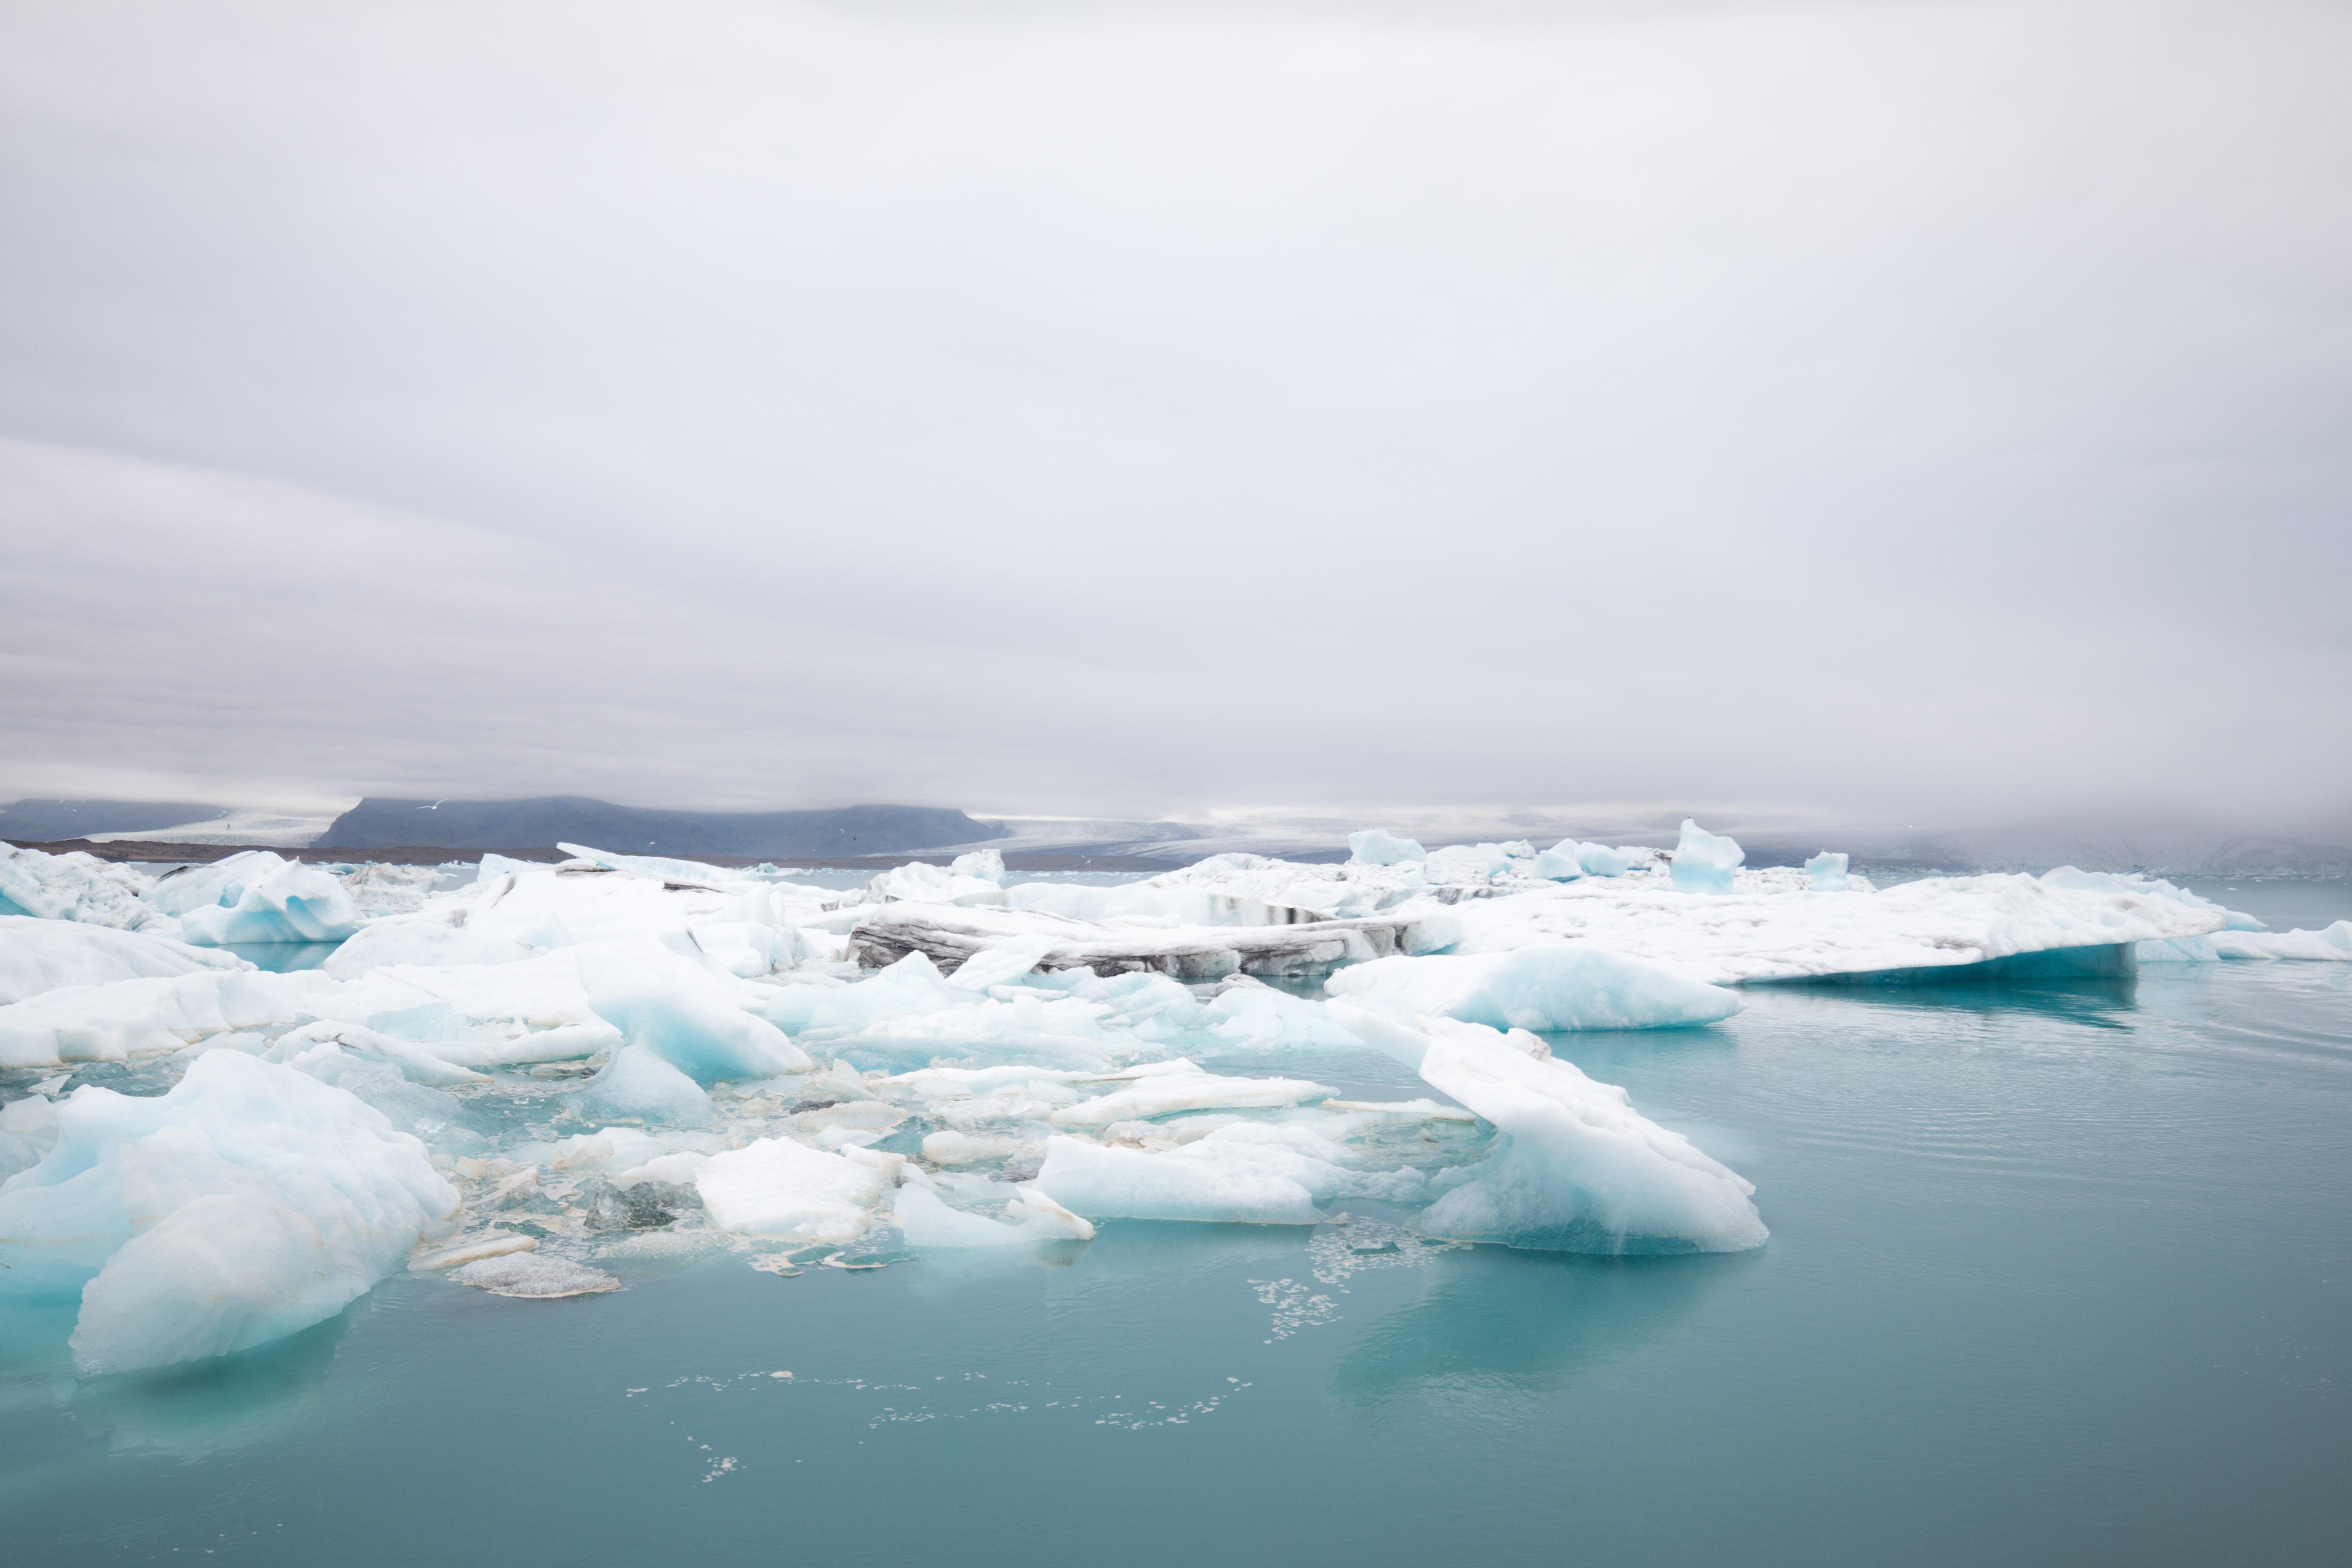 voyage en islande pendant 8 jours avec ma maman I Sp4nkblog_-27